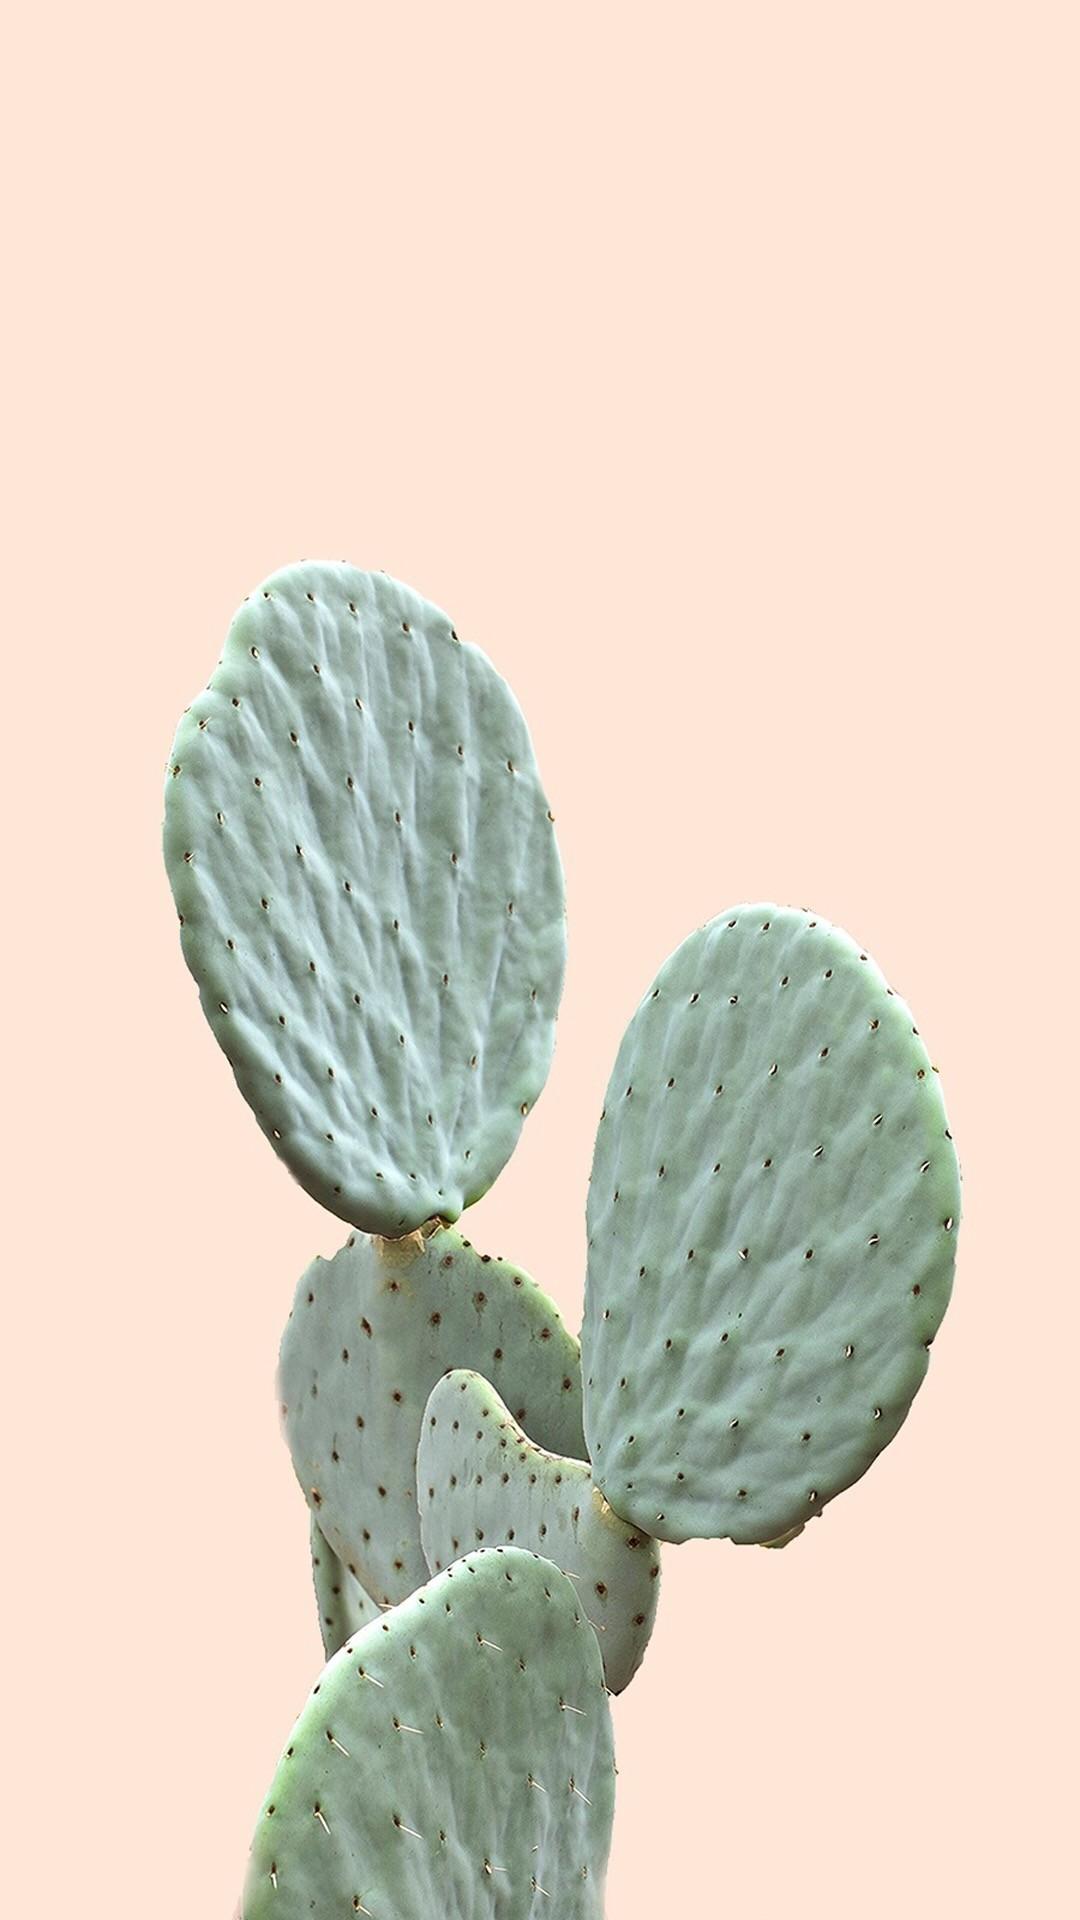 Cactus iphone 5 wallpaper